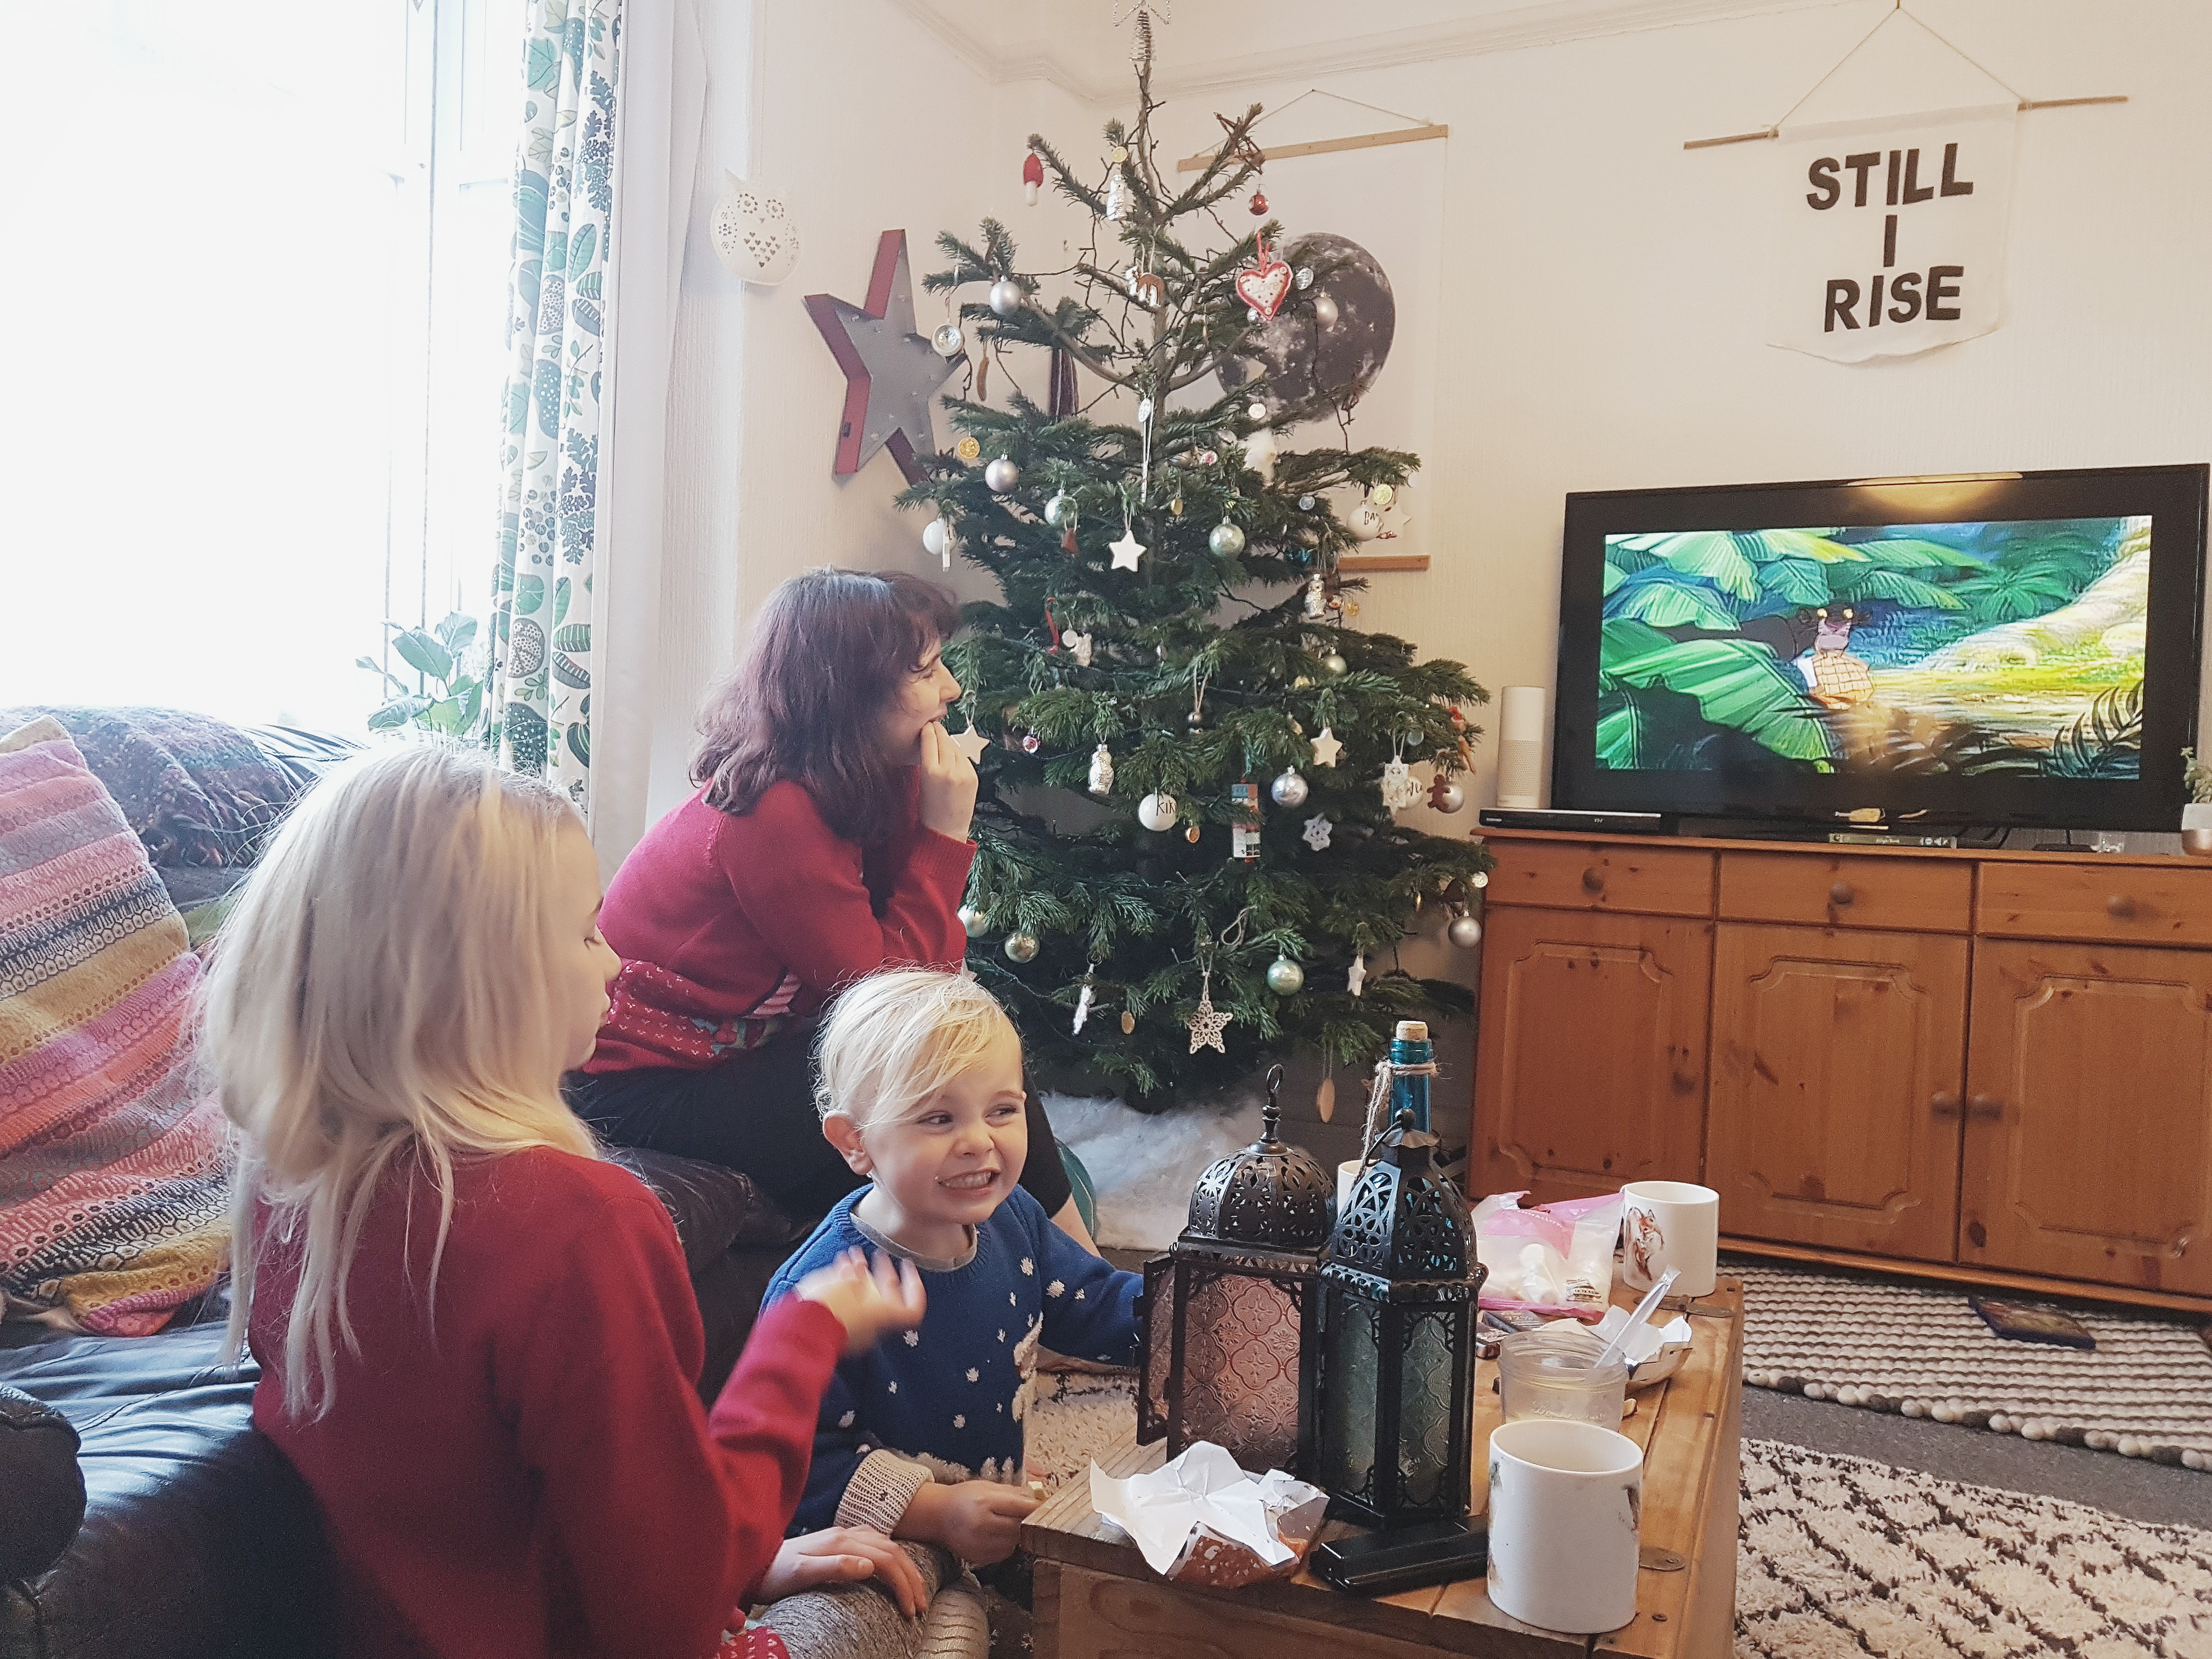 Making memories at Christmas